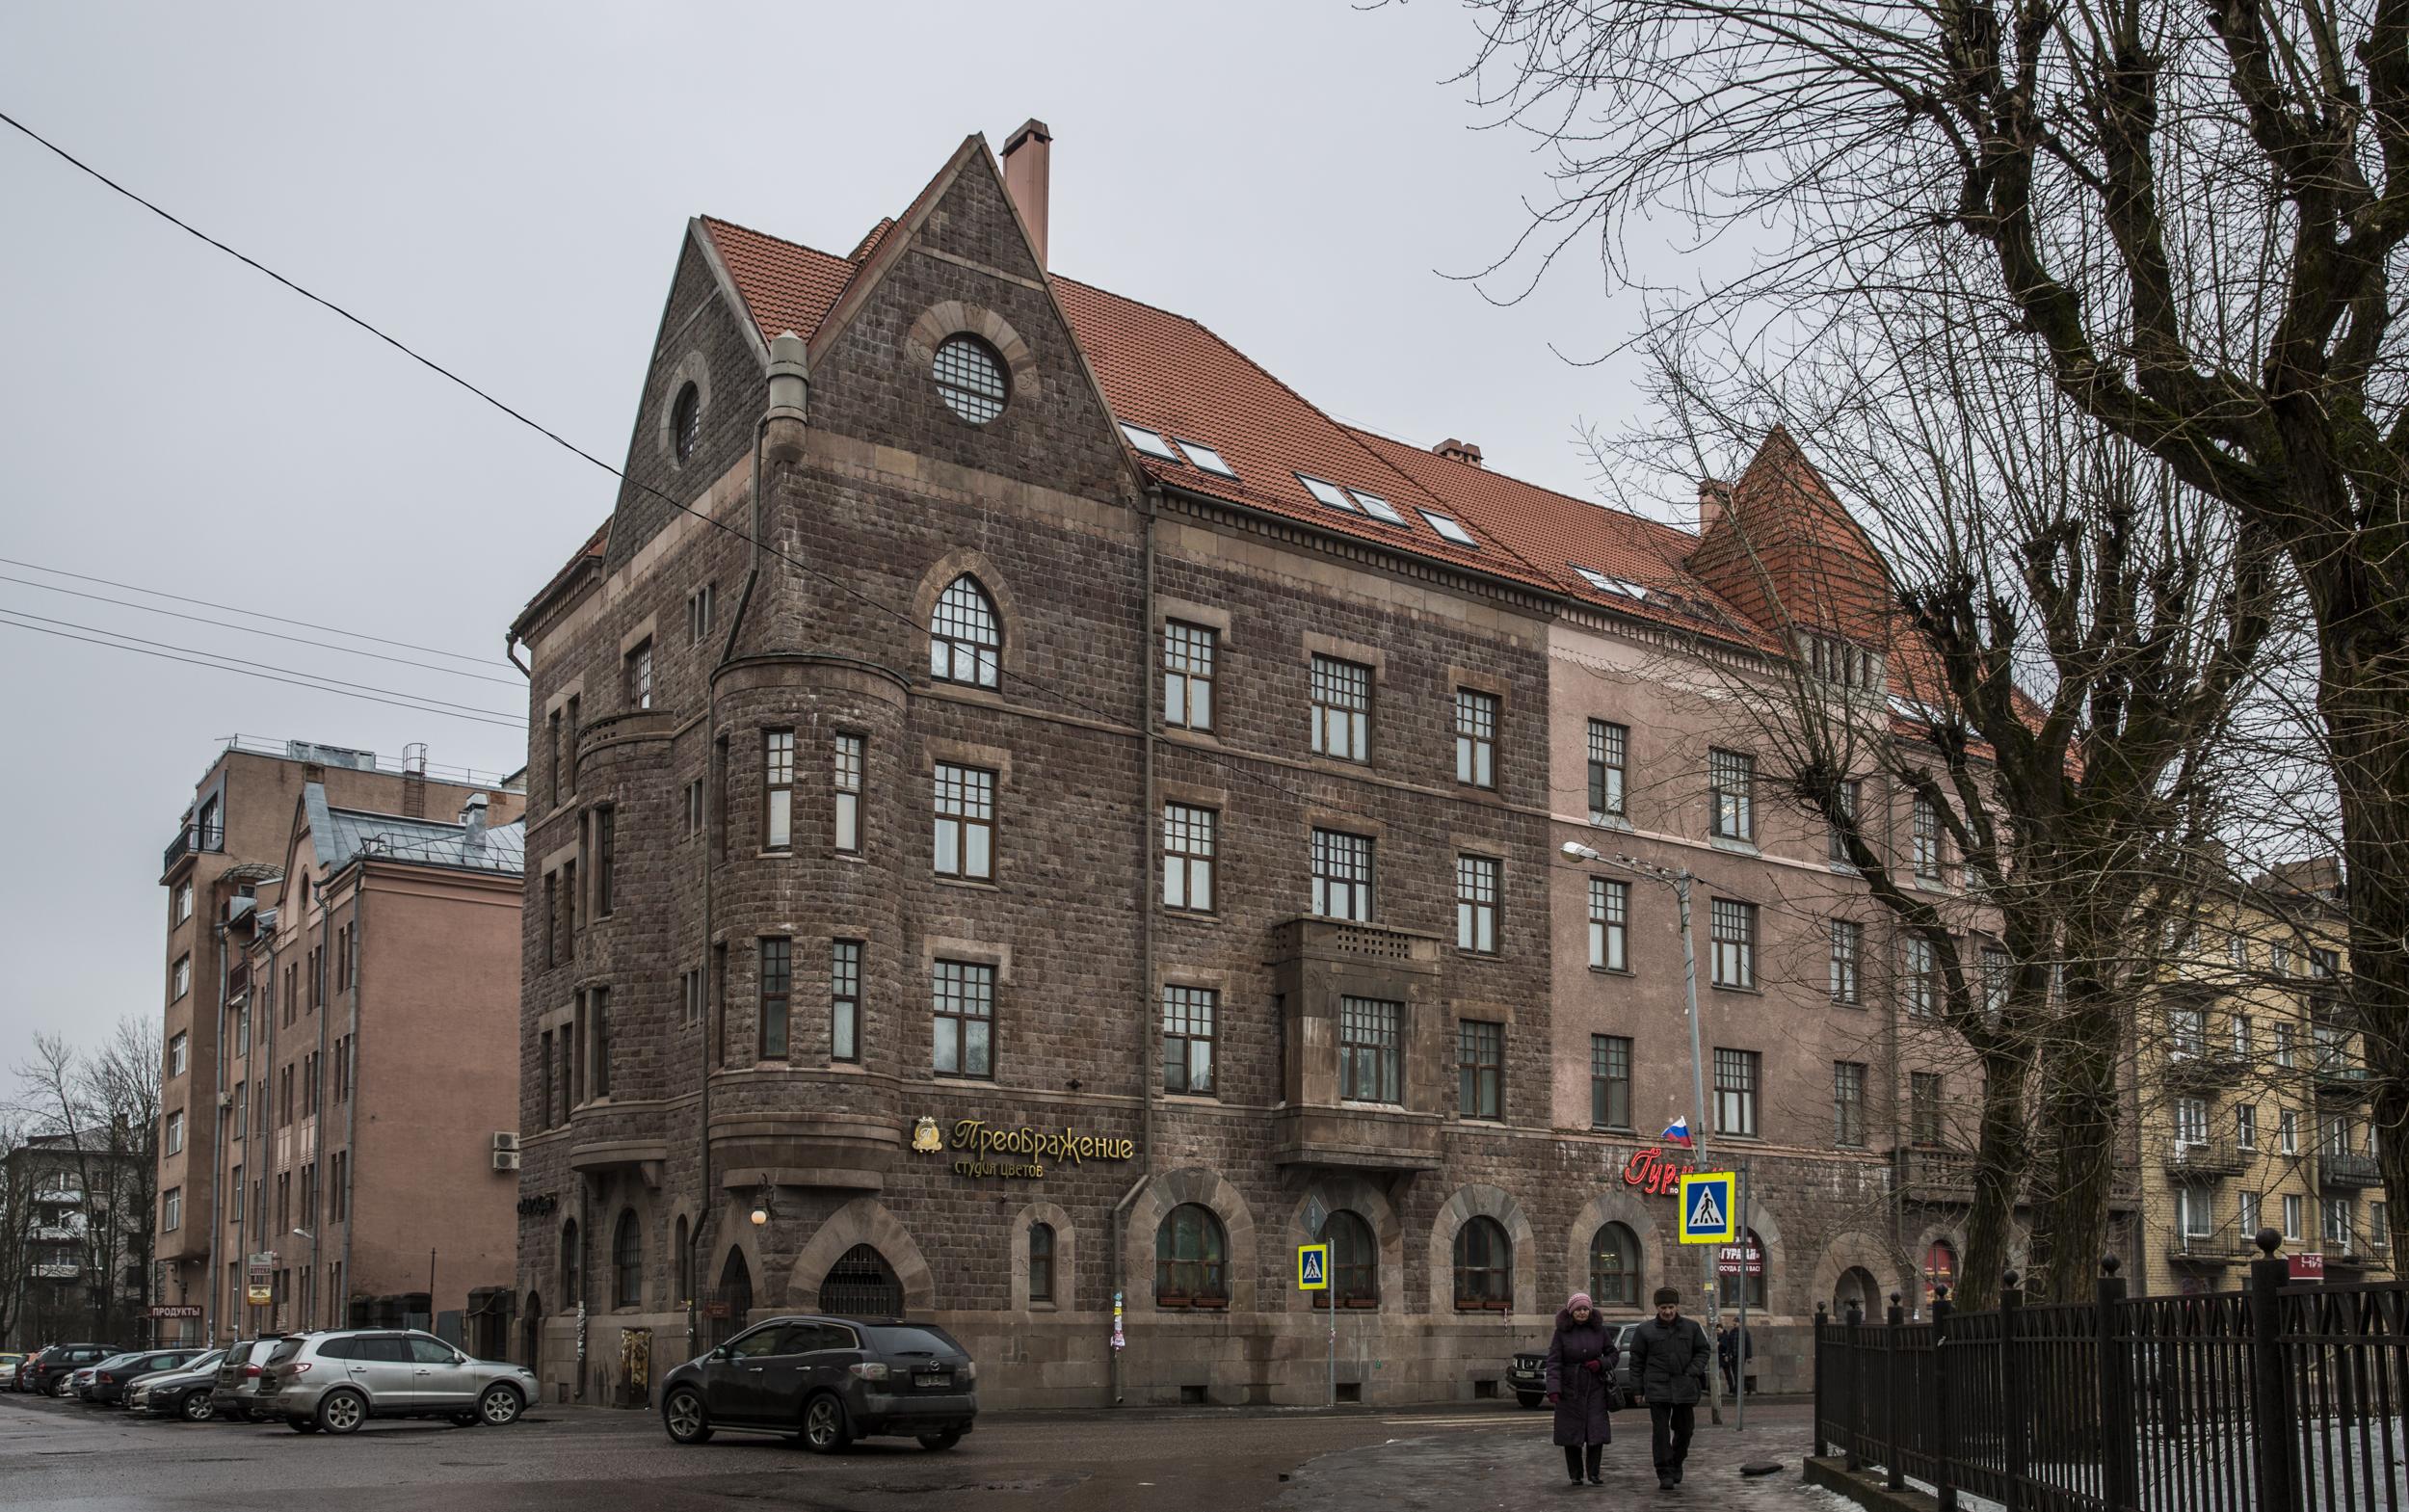 vyborg_lallukka_house